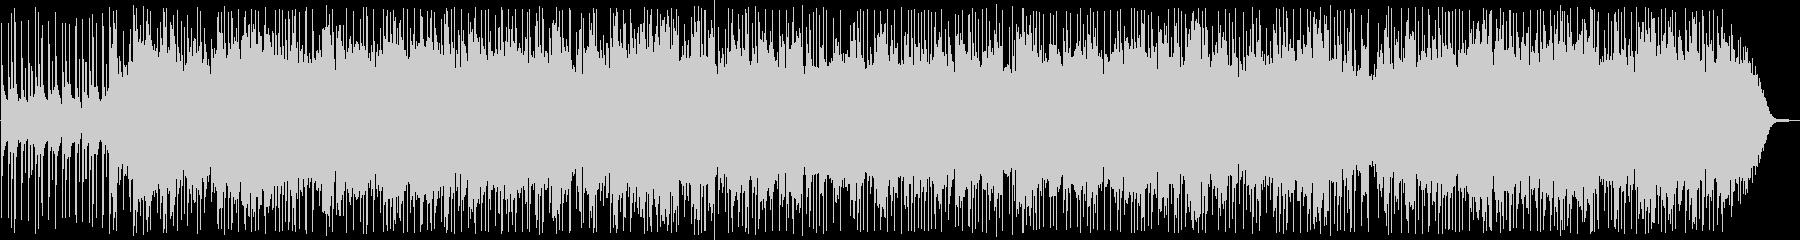 Shuri Akada (Akaterasu Doinchi)'s unreproduced waveform